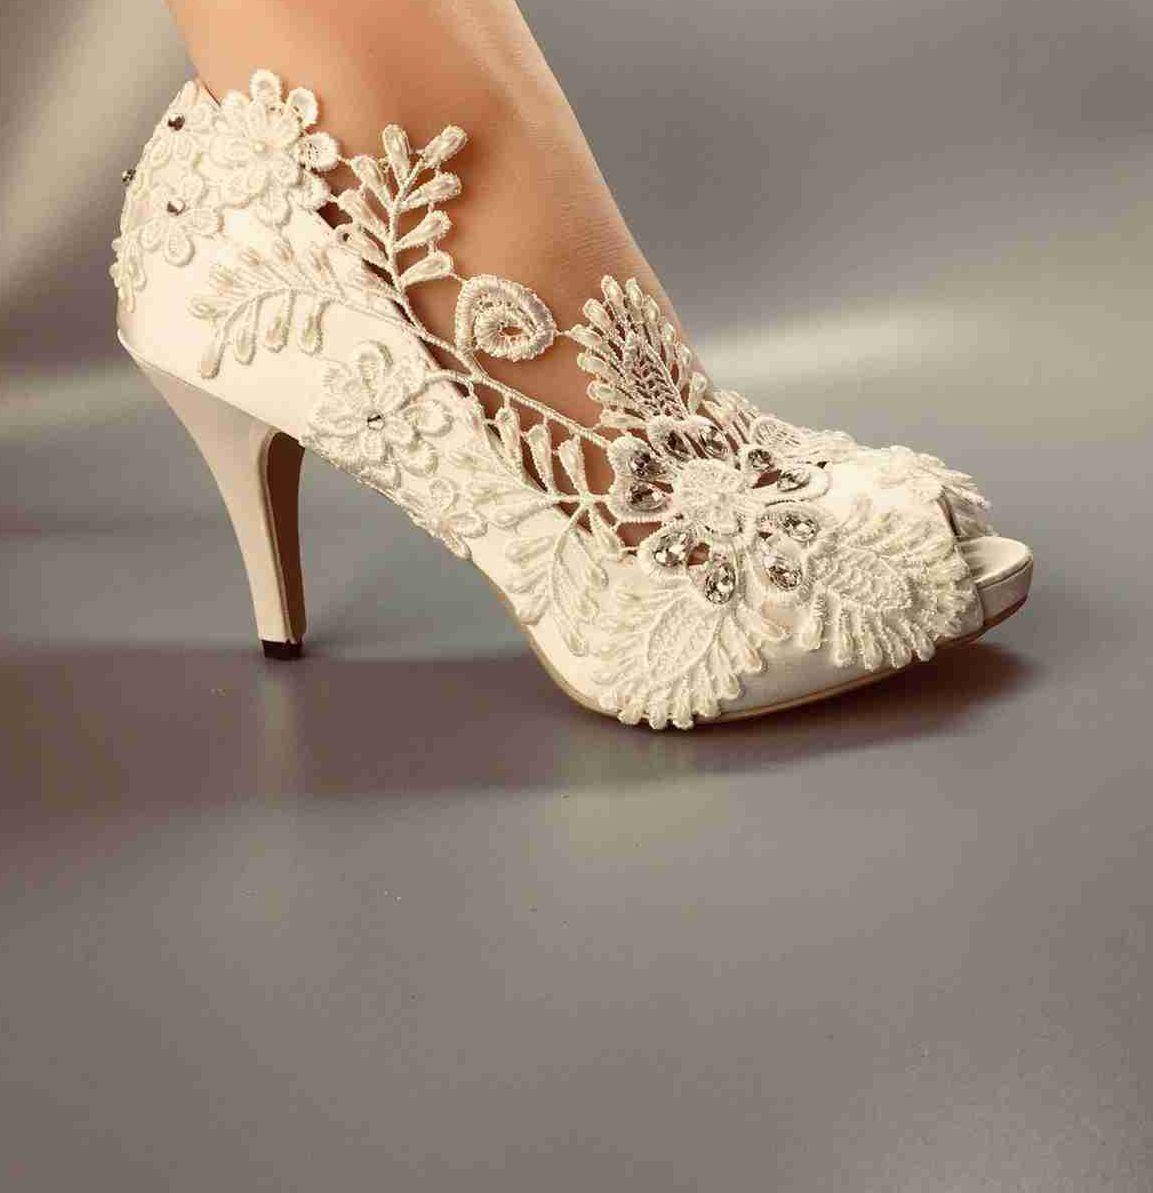 de4f9b0594d Women Wedding Peep Toe Shoes Waterproof White Lace Bride Wedding Dresses  HEEL Diamond Lace Manual Wedding BRIDAL HEEL Shoes SIZE EU 35 42 Taupe  Wedding ...